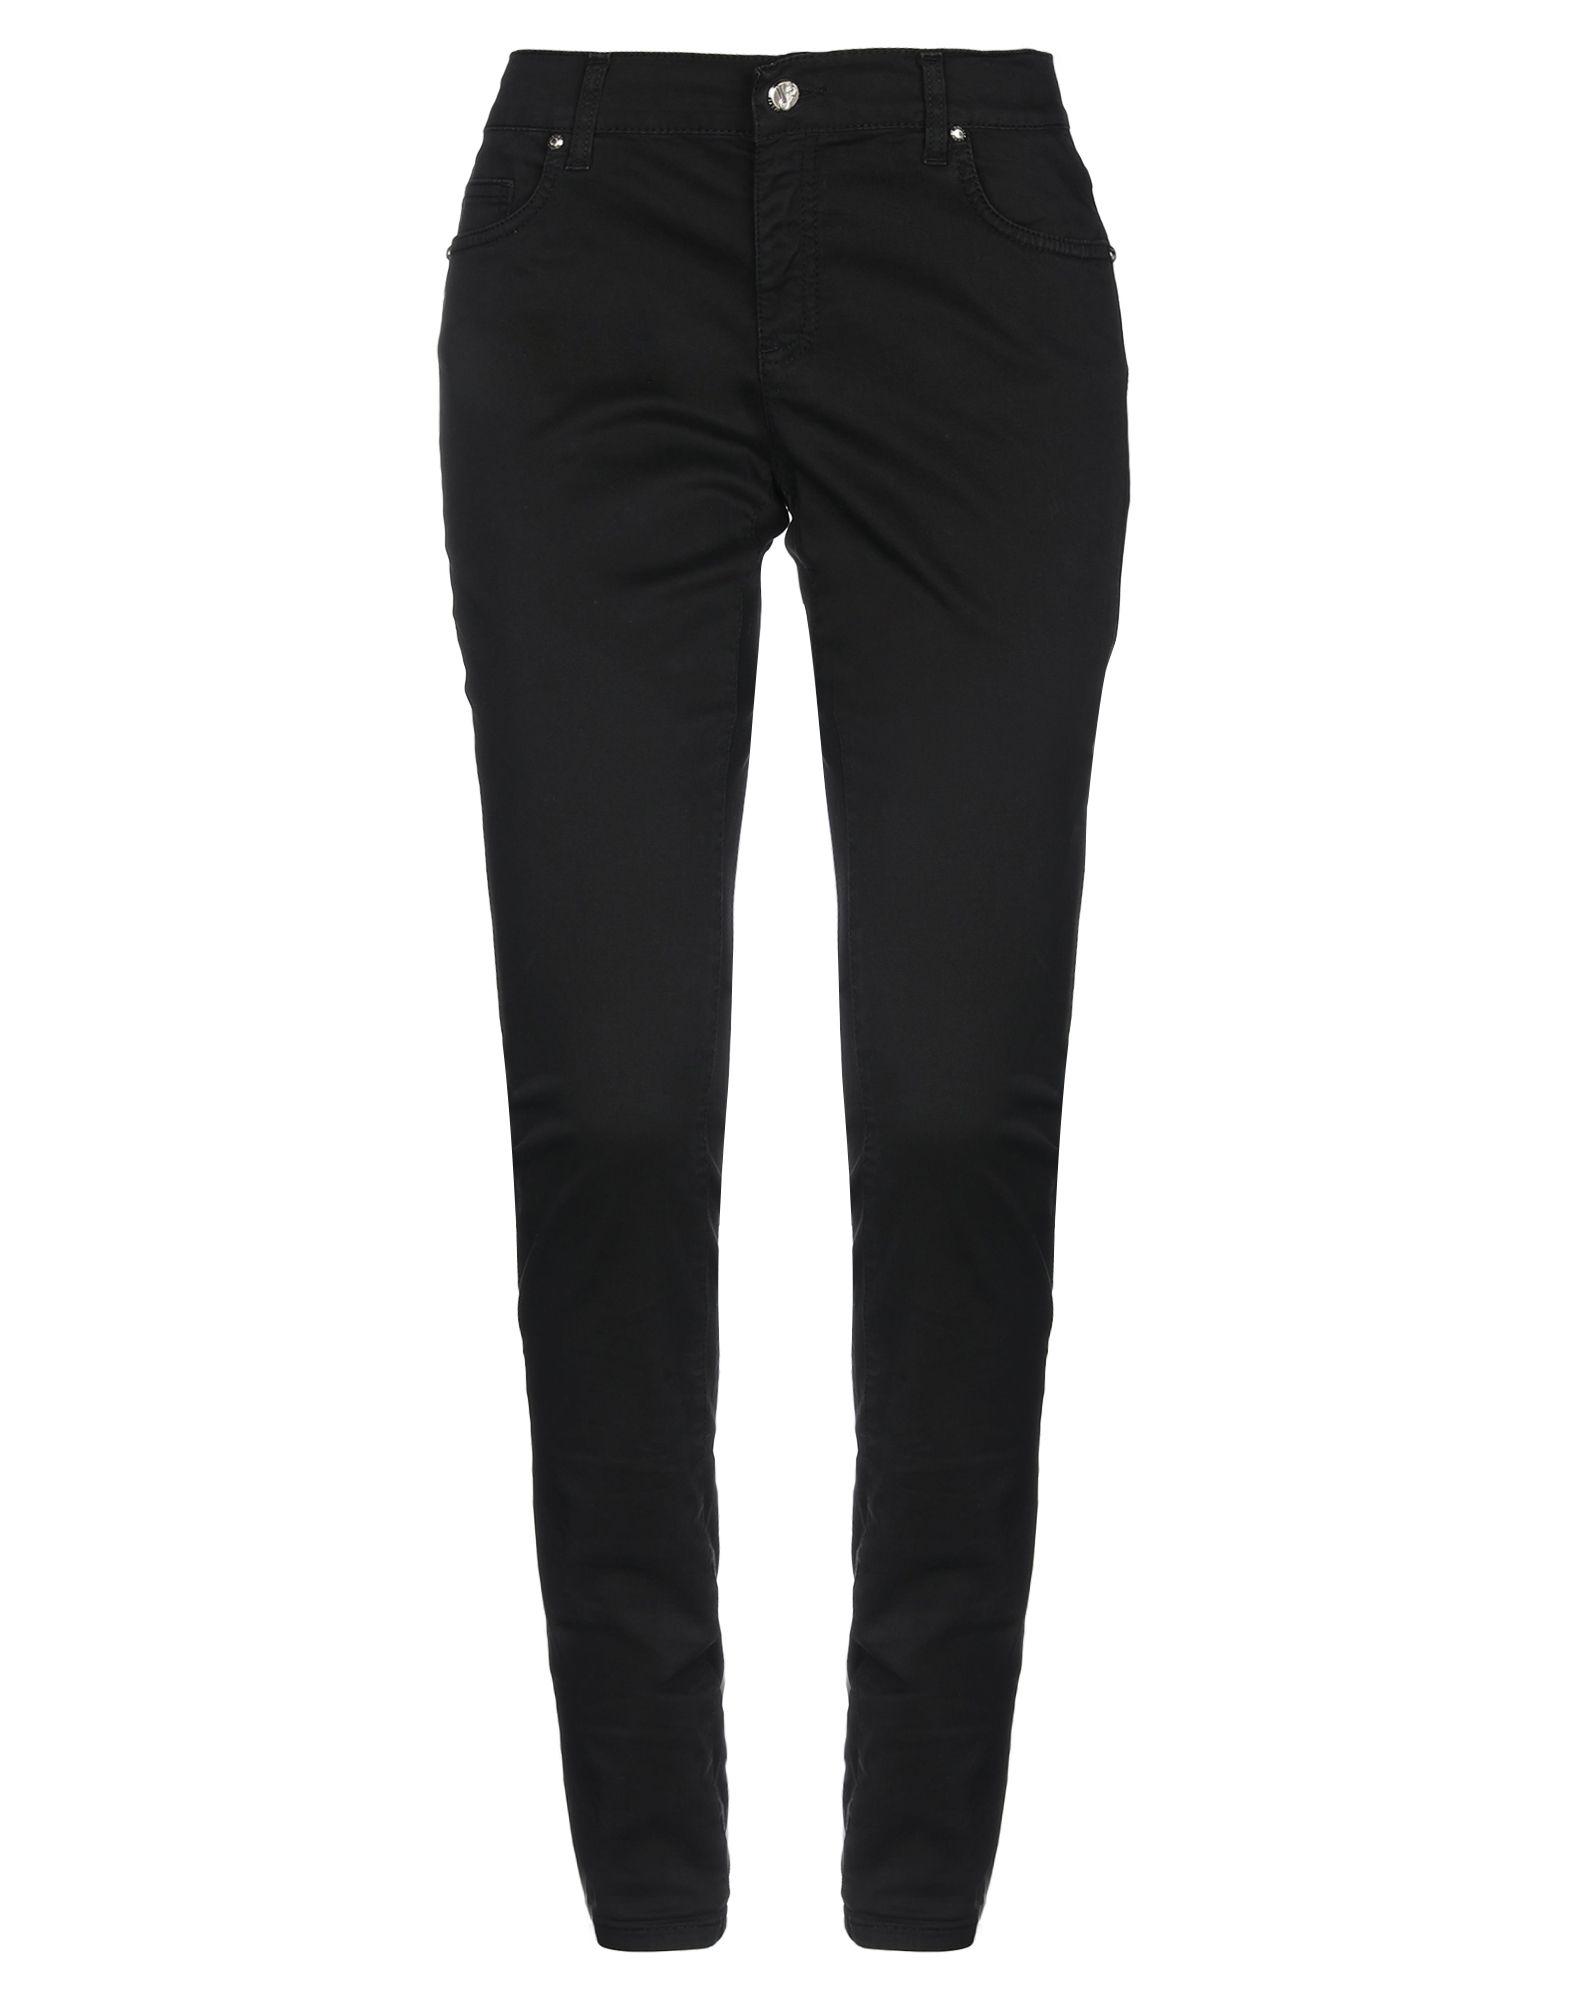 Pantalone  ersace Jeans Jeans Jeans donna - 13153144LC f3c